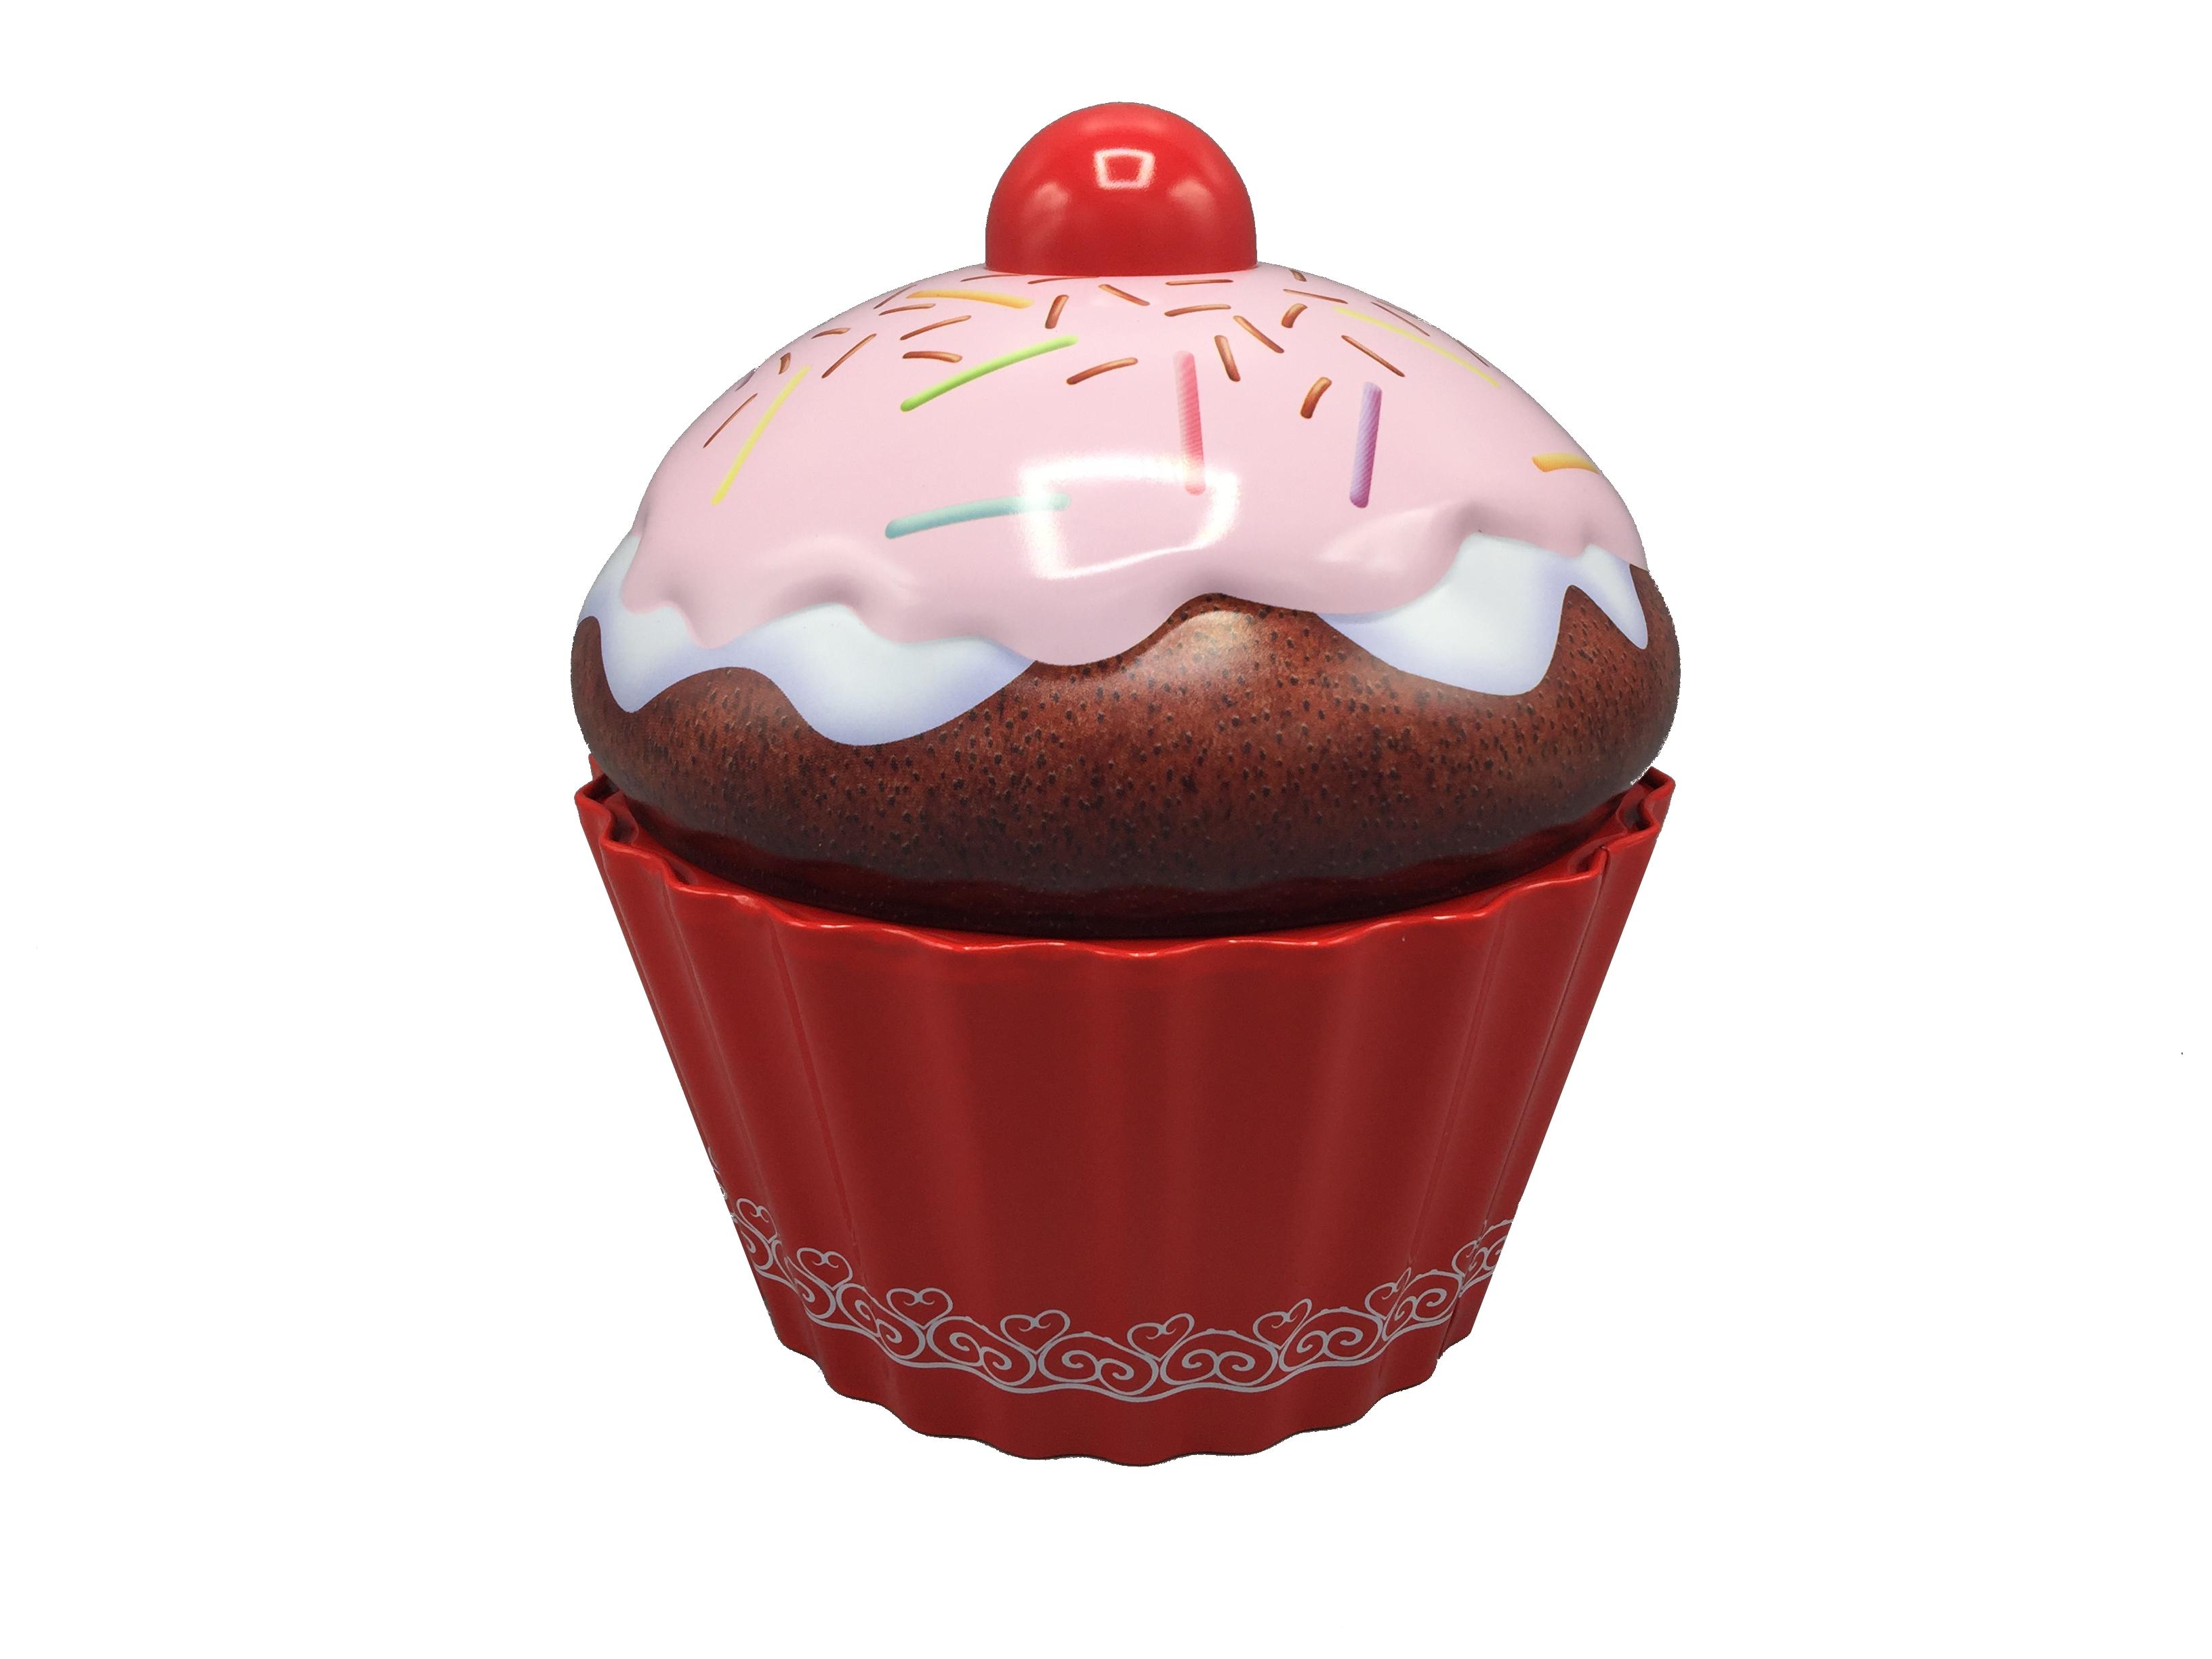 10200 Großer Cupcake mit Streusel